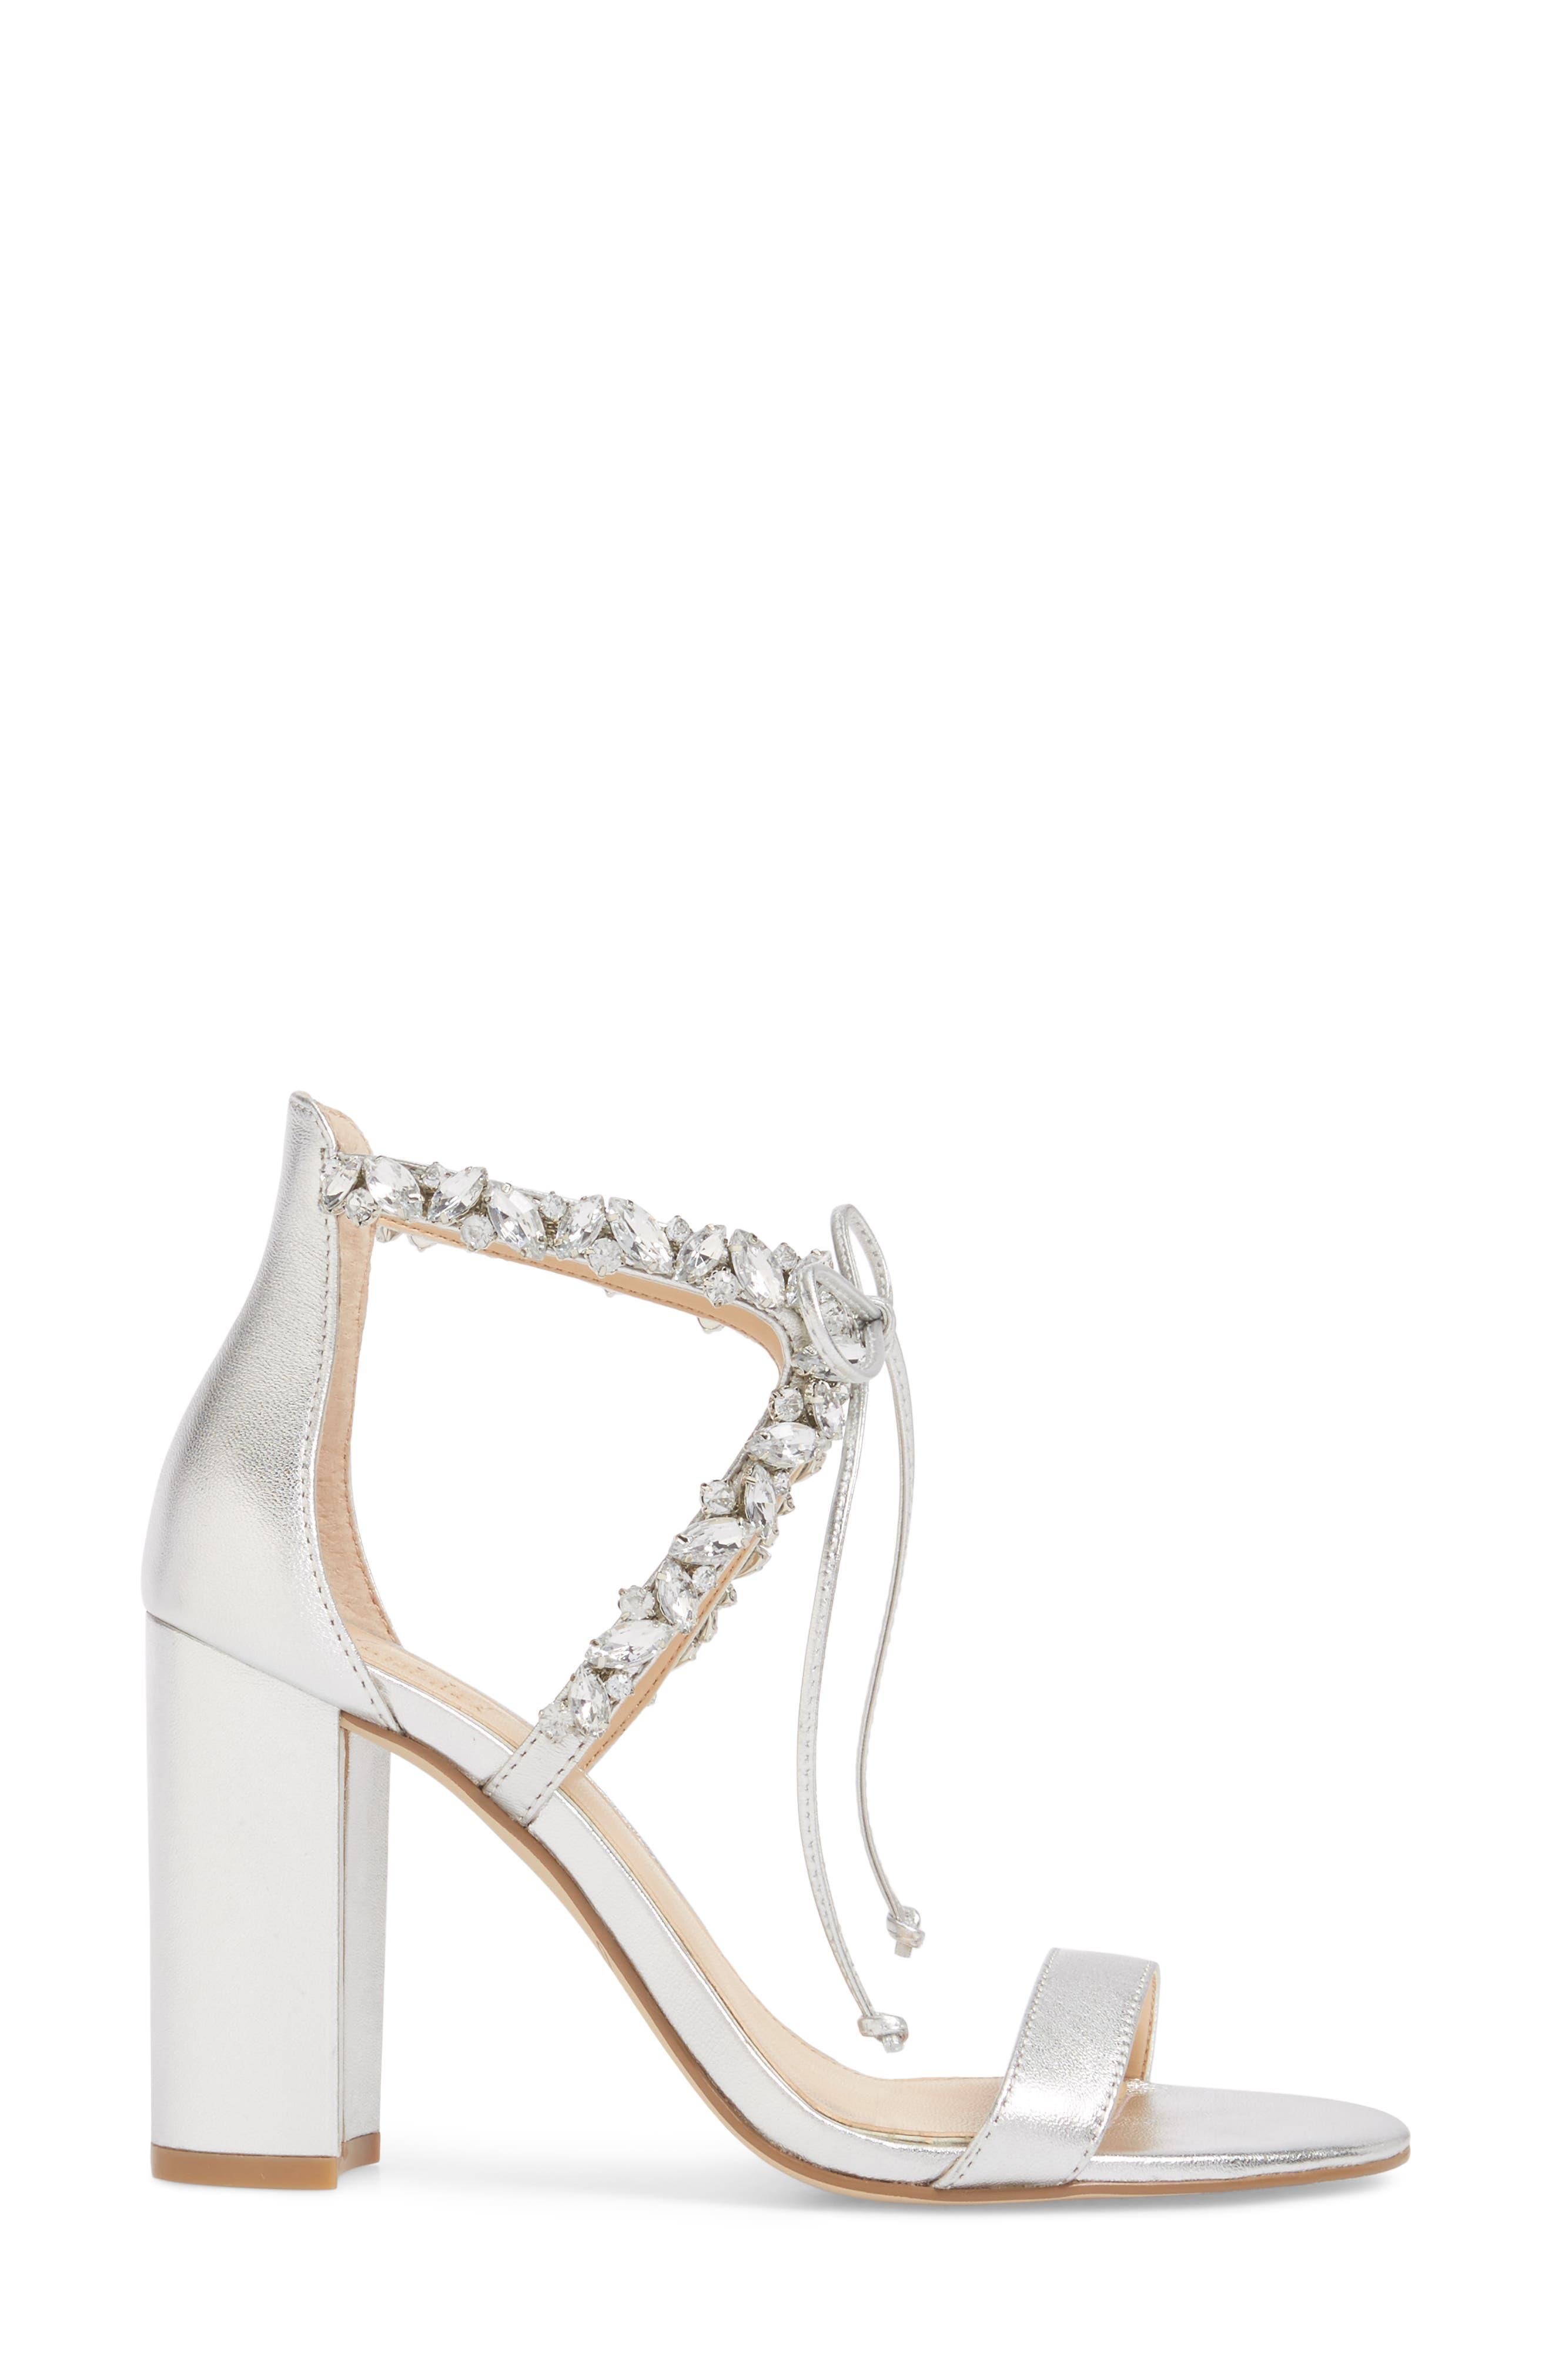 Thamar Embellished Sandal,                             Alternate thumbnail 3, color,                             Silver Leather